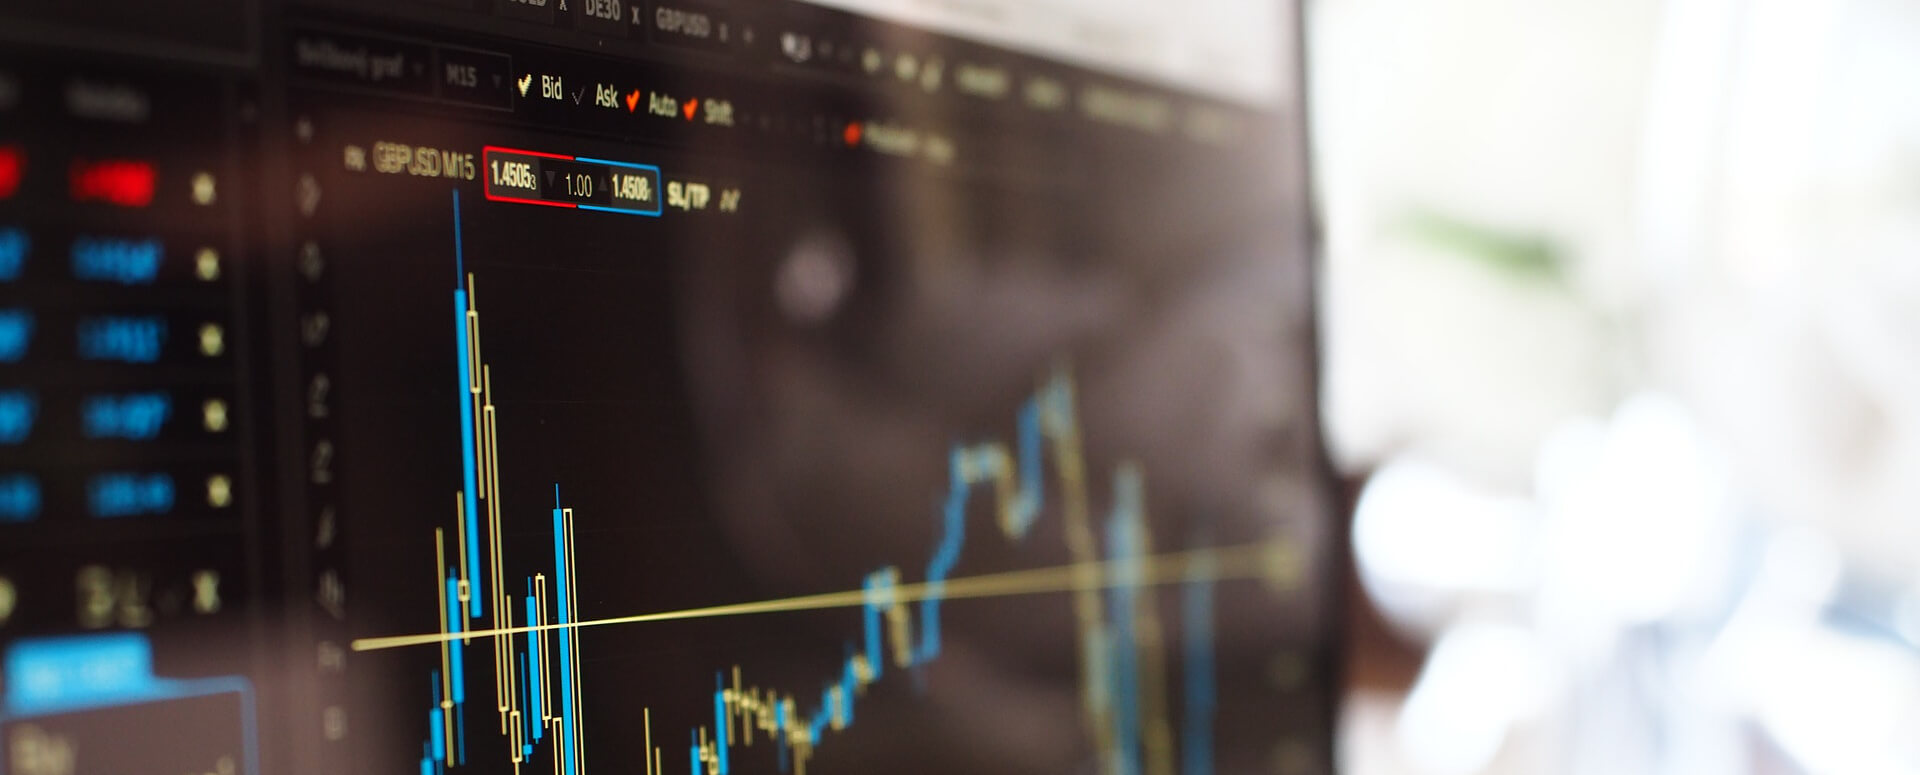 Stocks on computer screen